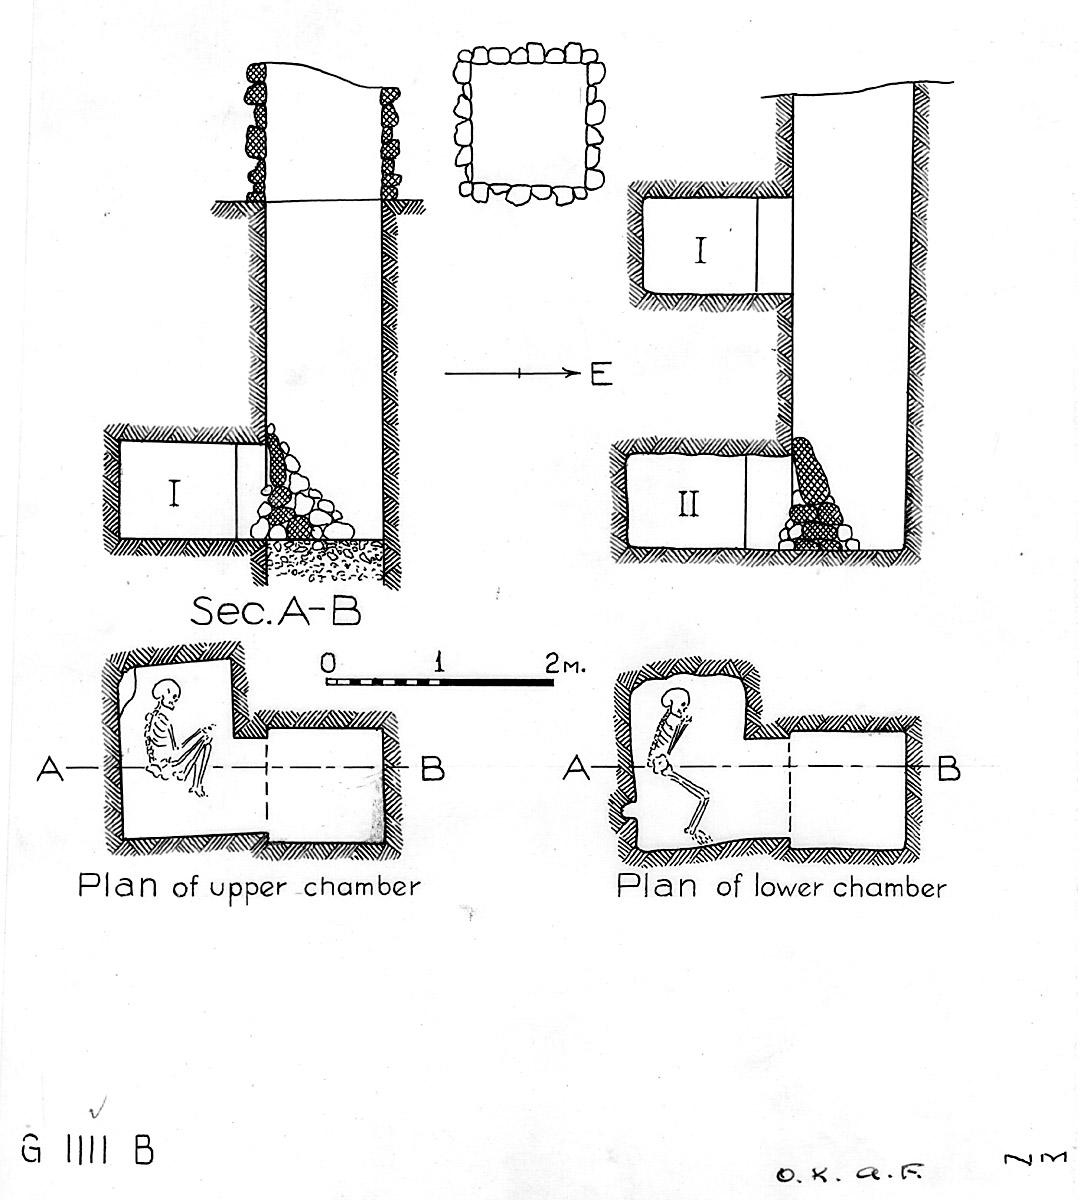 Maps and plans: G 1111, Shaft B (I & II)